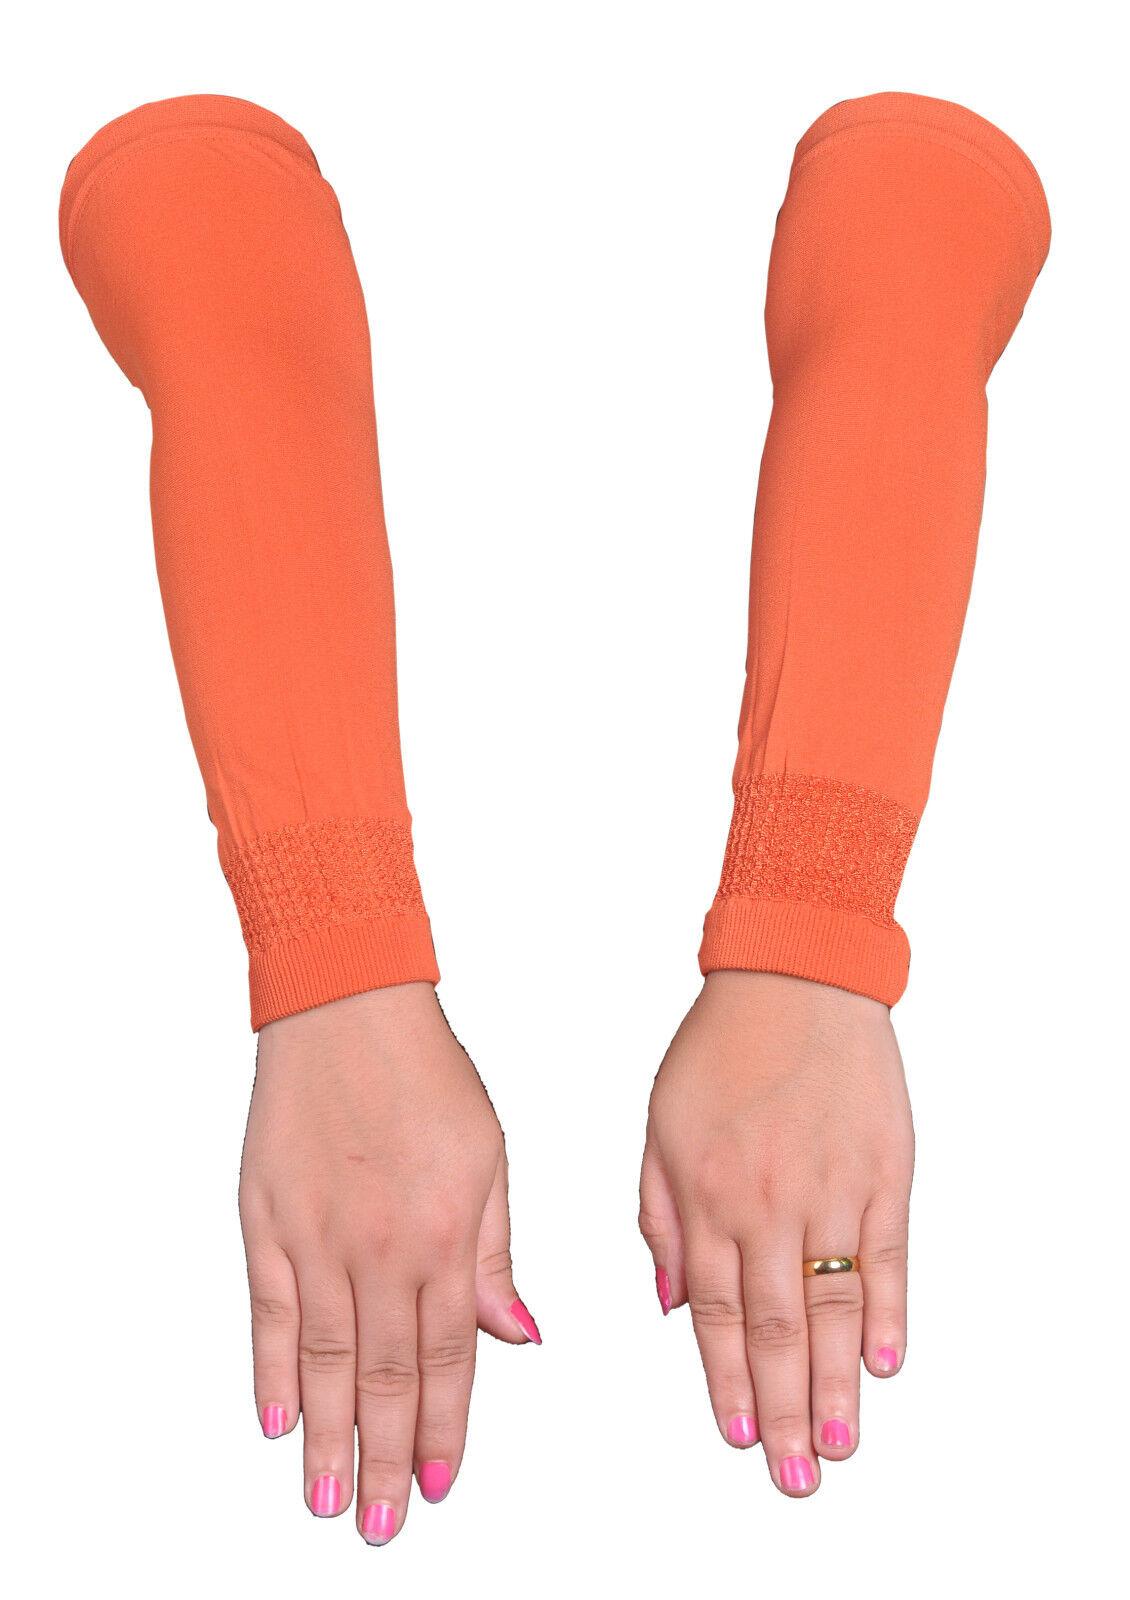 Orange (HI00139)